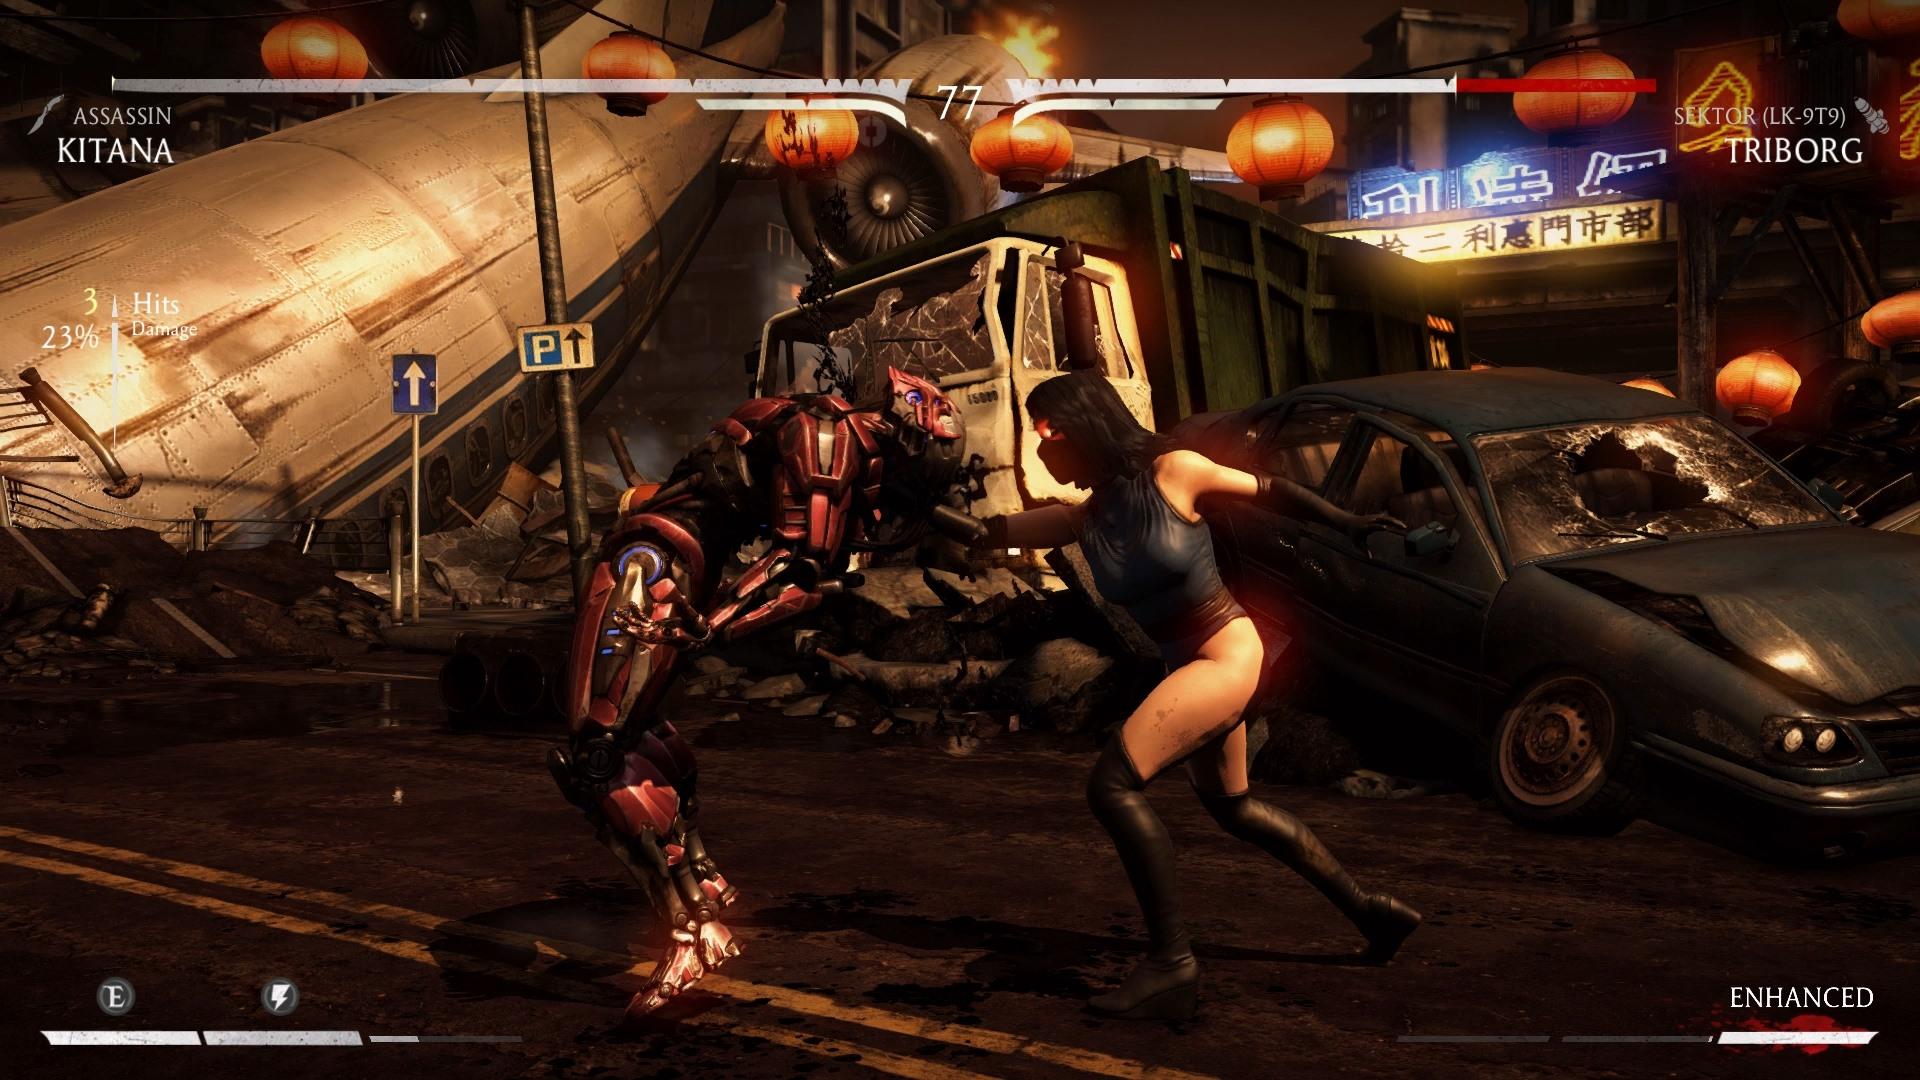 Mortal Kombat Retrospektive, Part 16: MORTAL KOMBAT X (2015